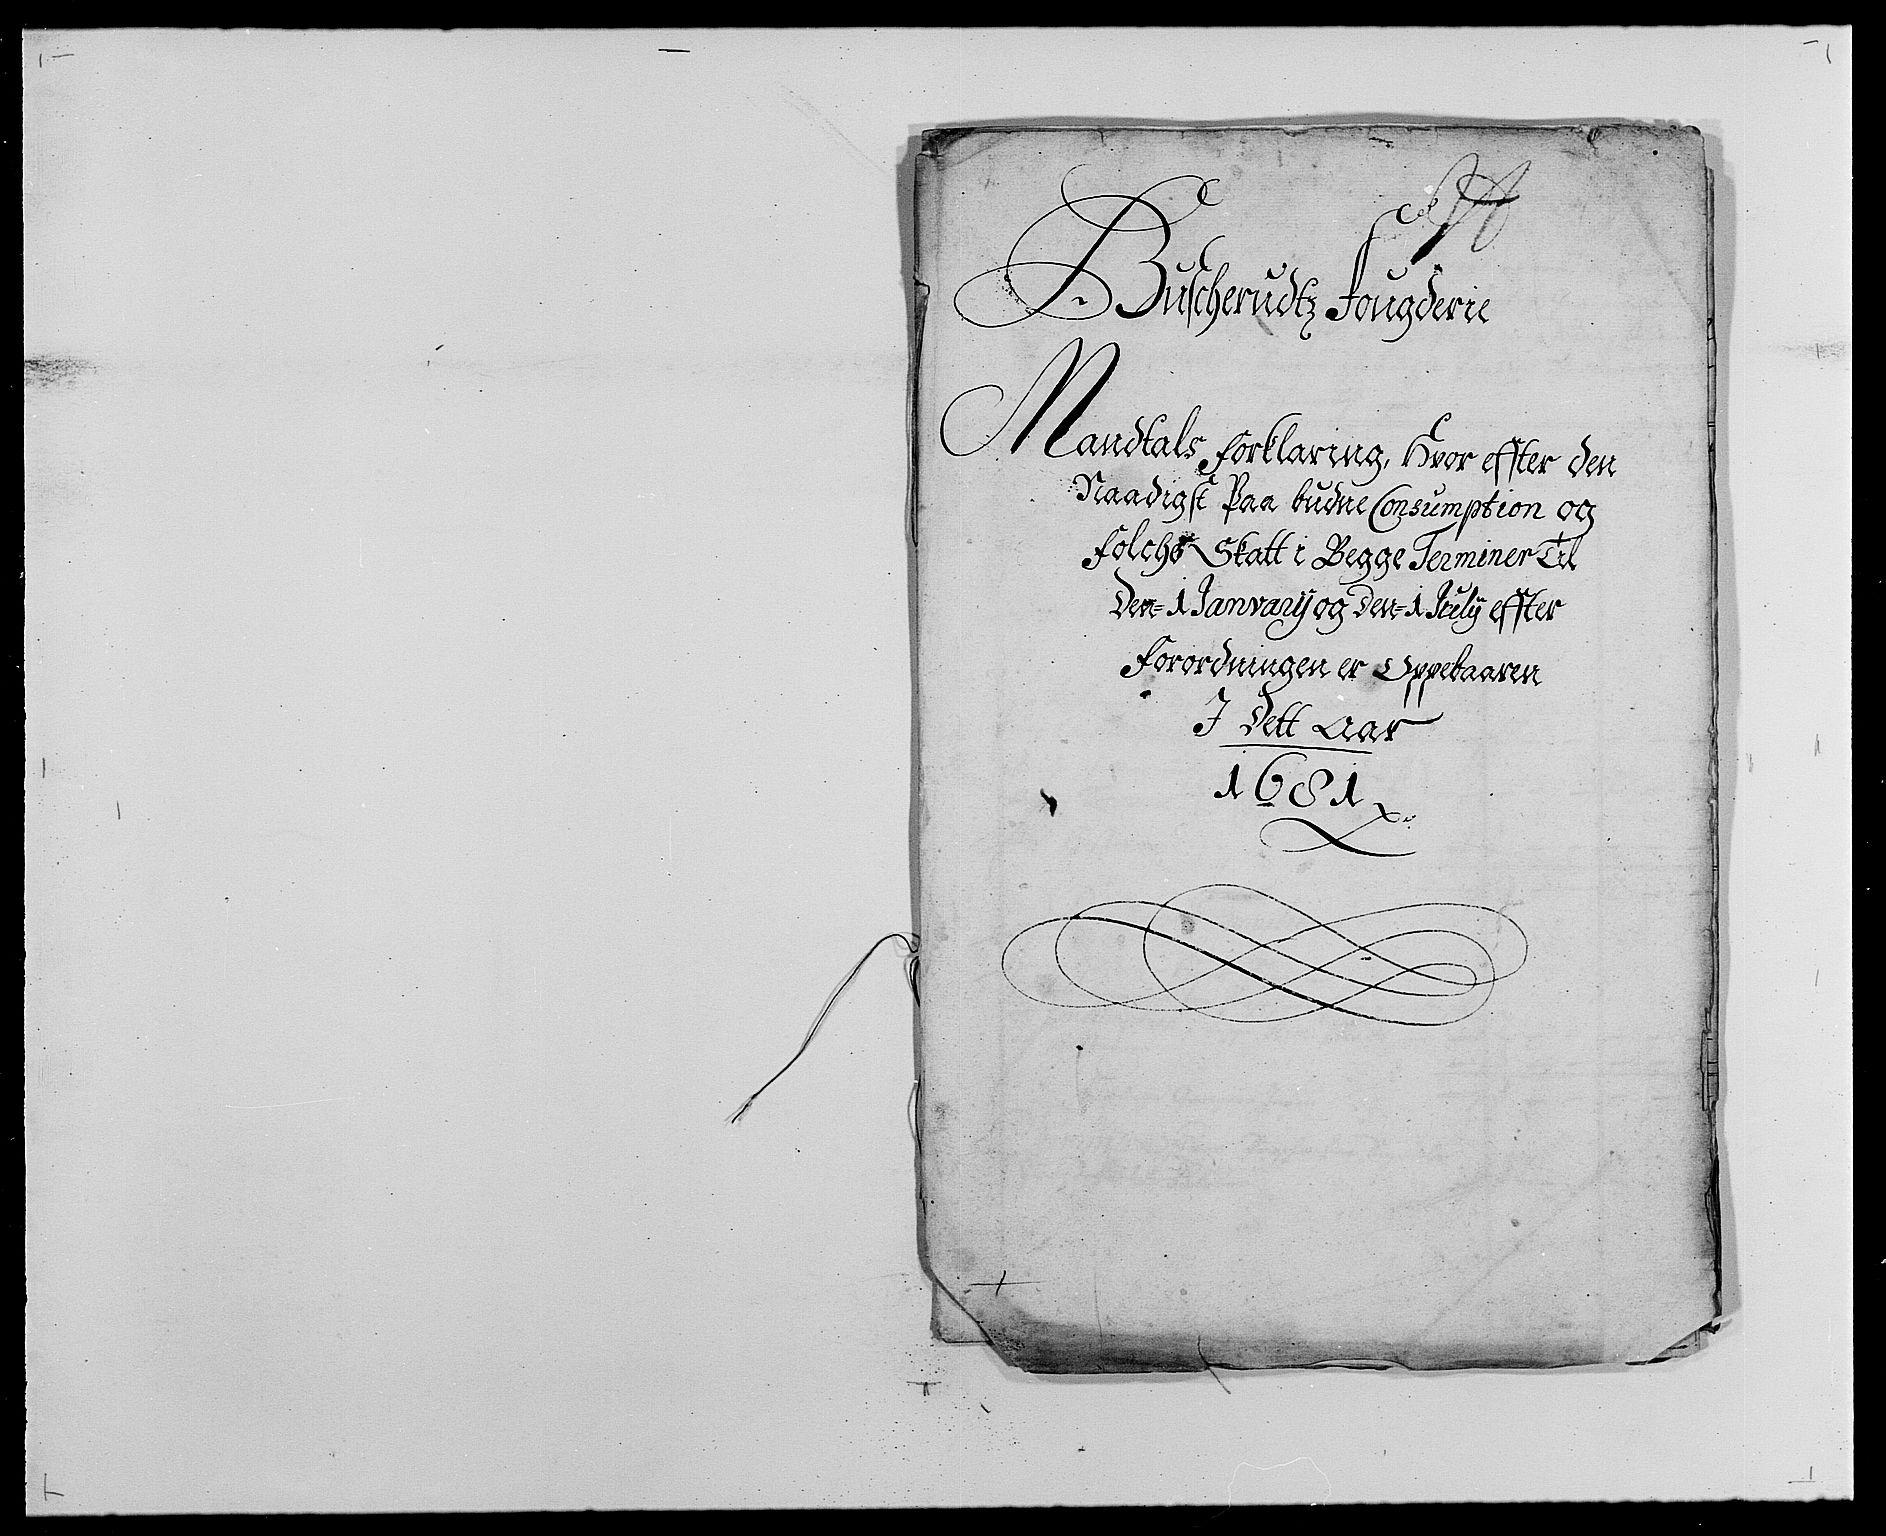 RA, Rentekammeret inntil 1814, Reviderte regnskaper, Fogderegnskap, R25/L1675: Fogderegnskap Buskerud, 1678-1681, s. 341